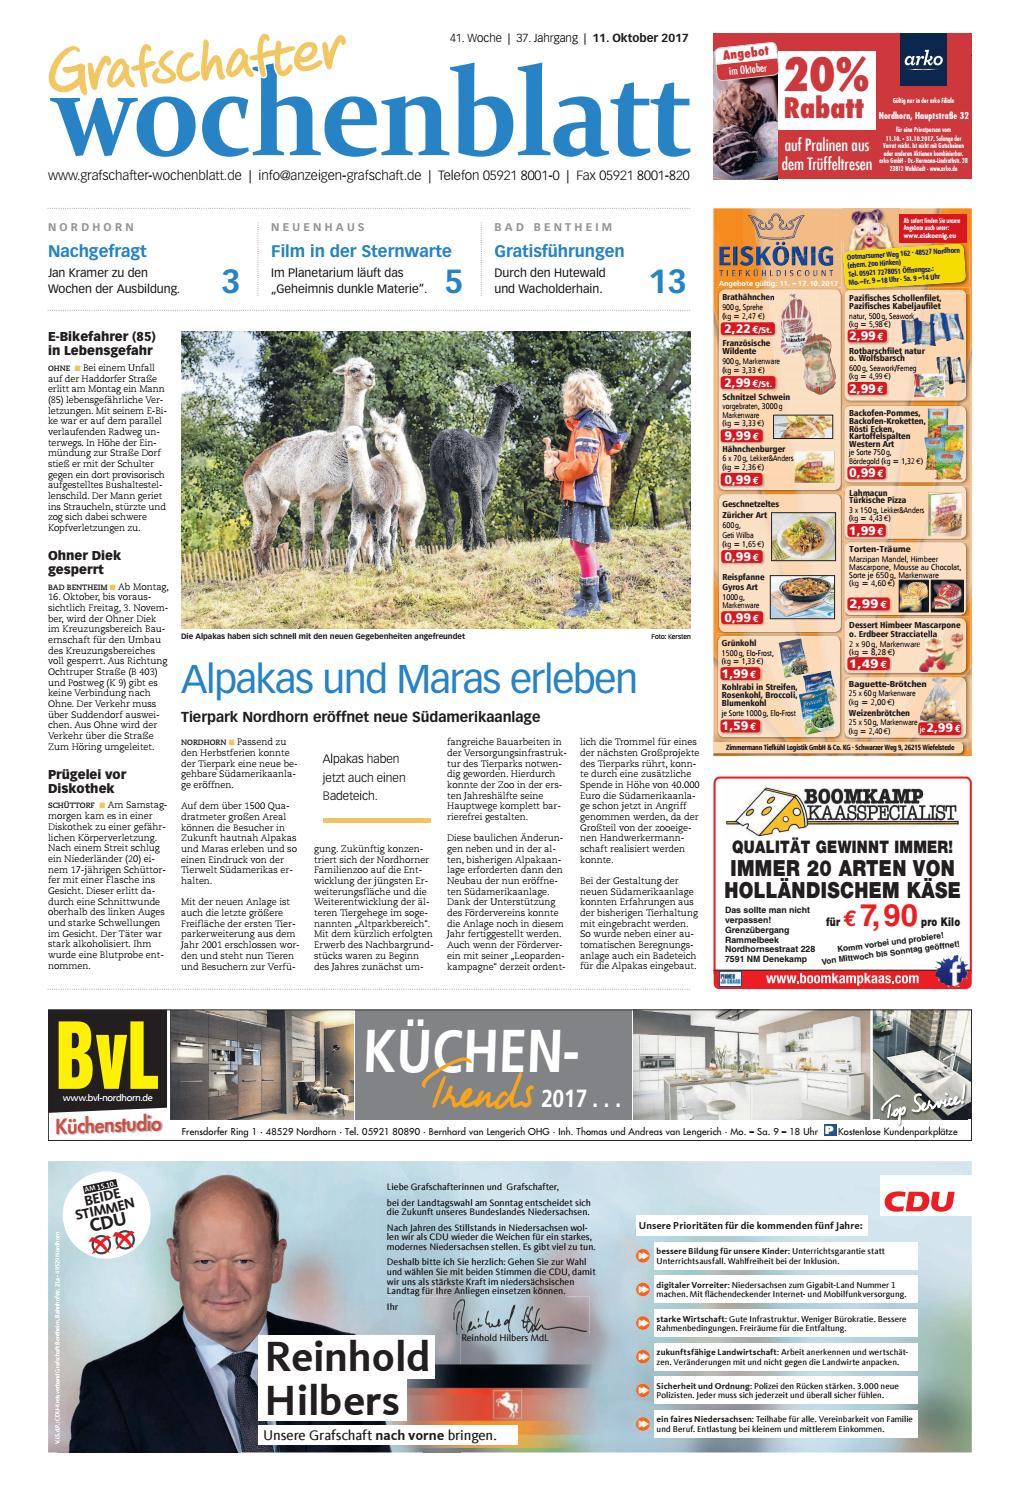 Grafschafter Wochenblatt_11-10-2017 by SonntagsZeitung - issuu